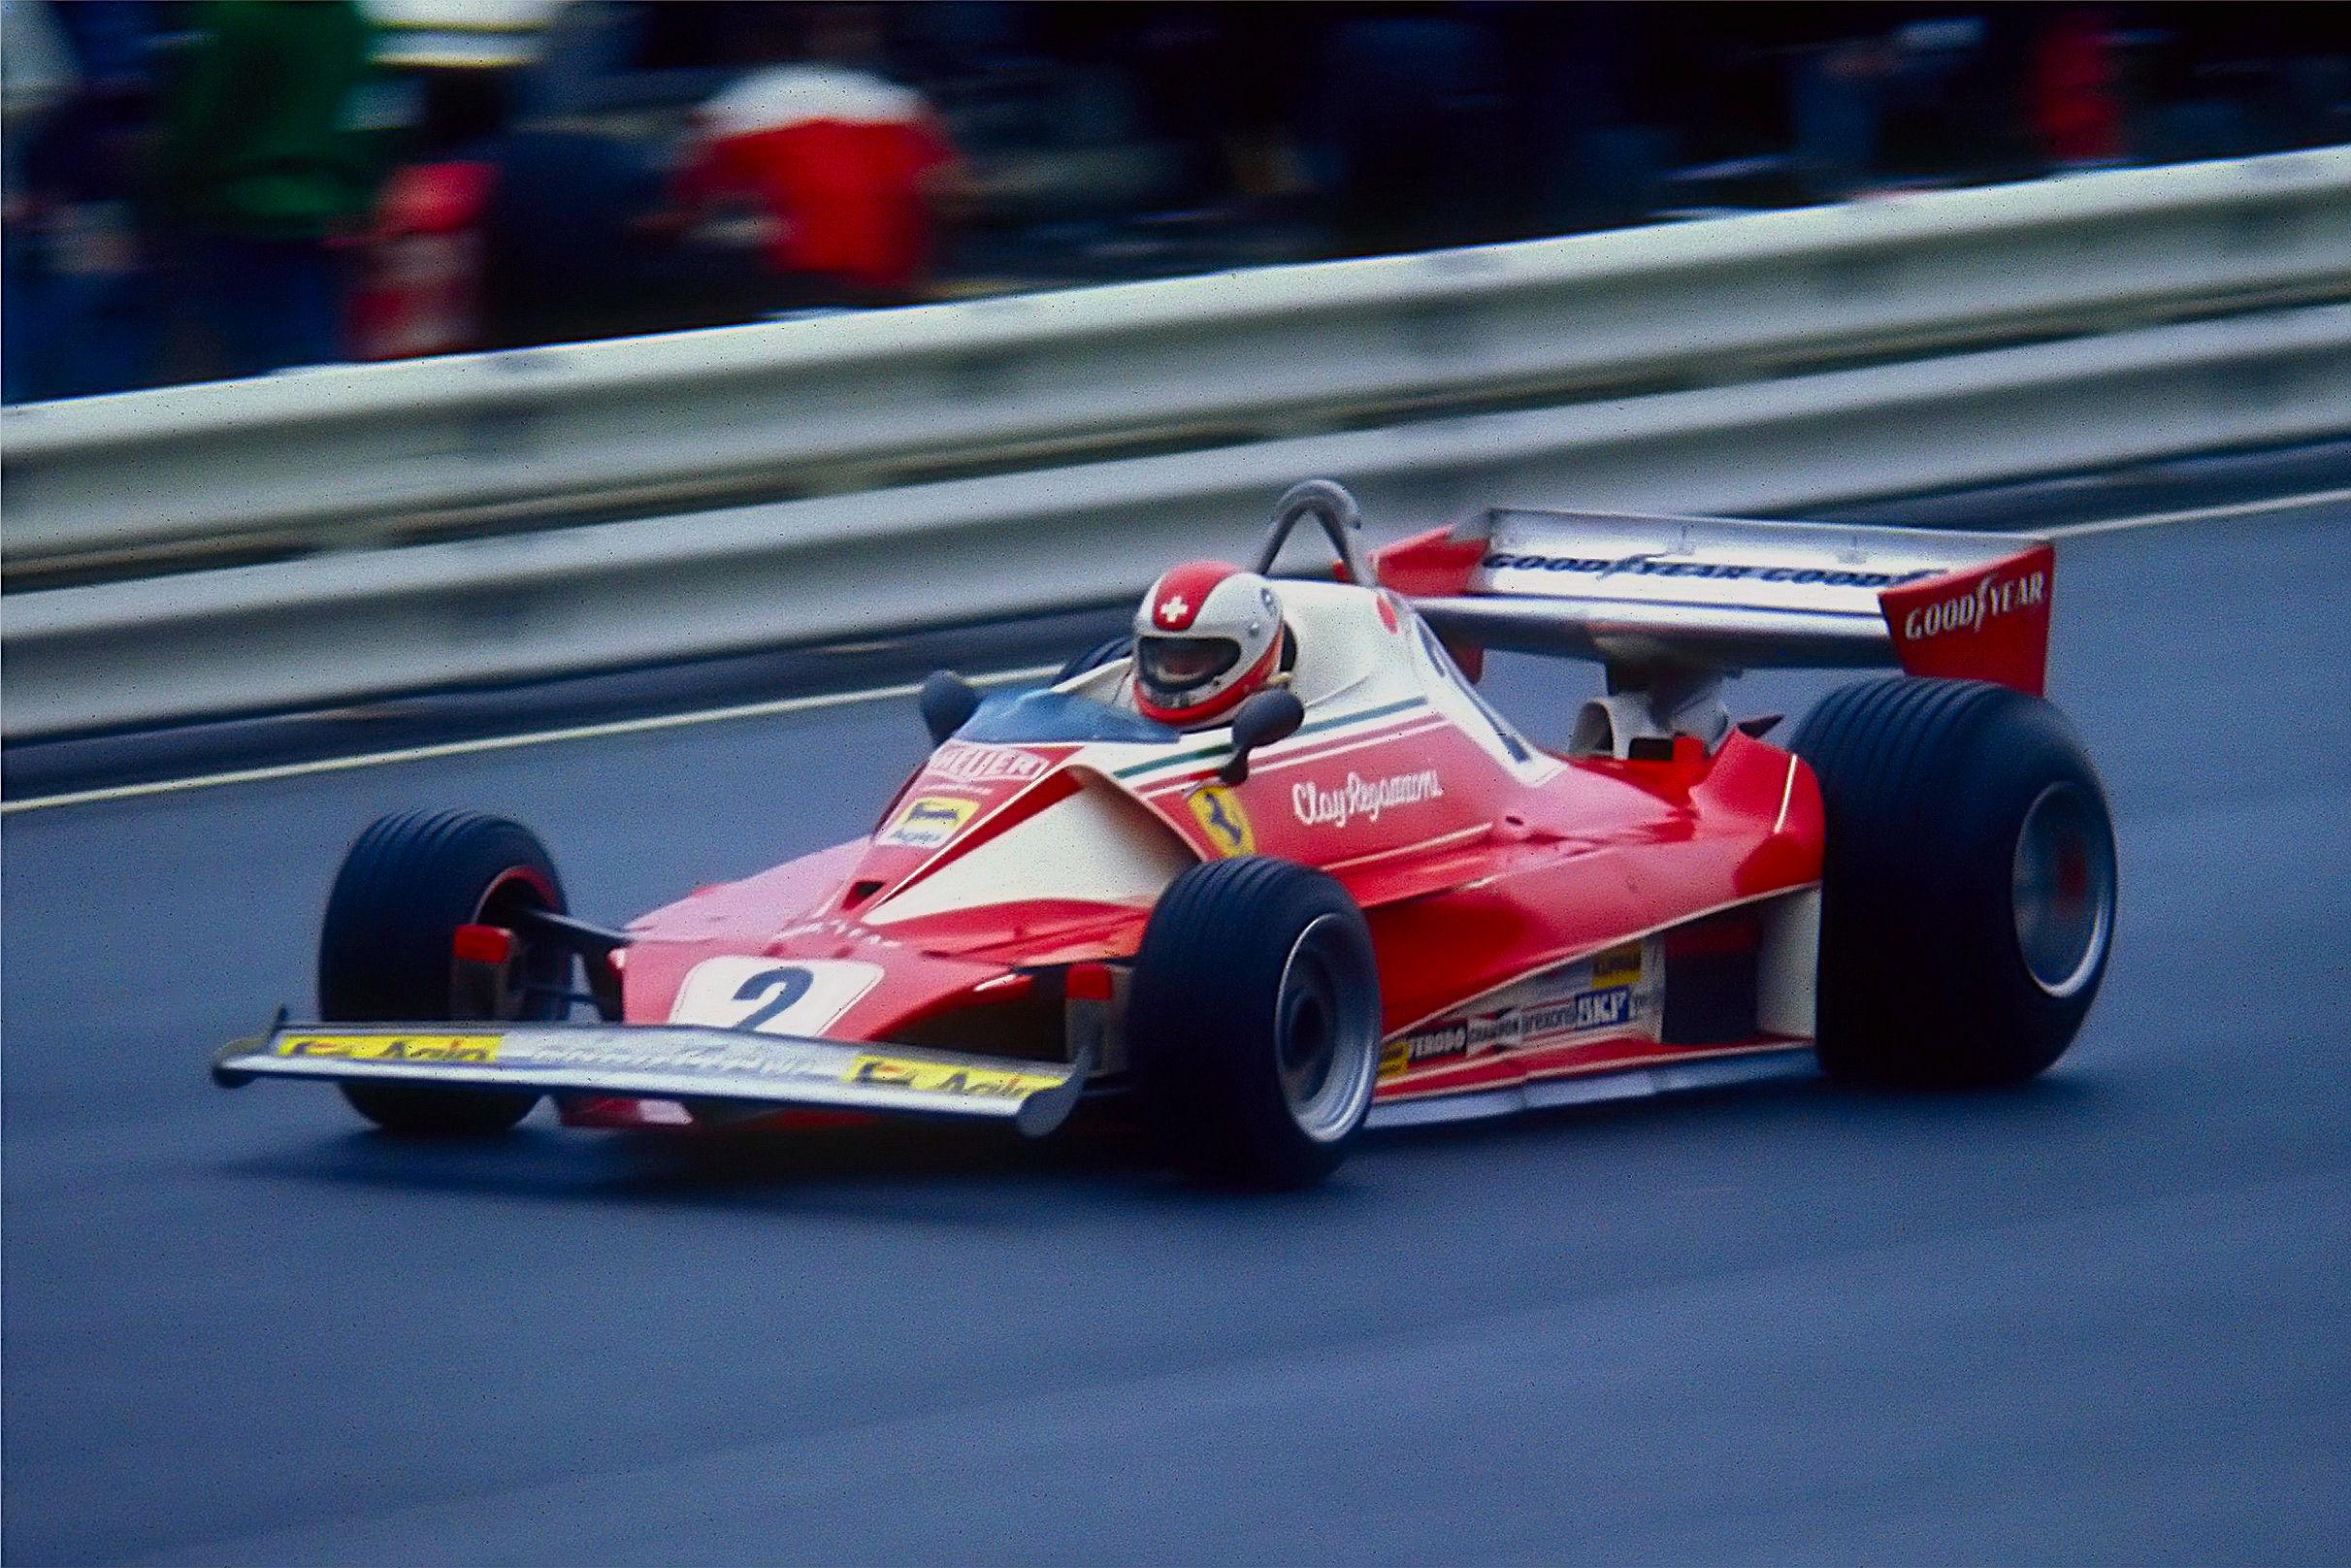 http://upload.wikimedia.org/wikipedia/commons/e/e7/Regazzoni%2C_Clay_am_31.07.1976_-_Ferrari_312T_2.jpg